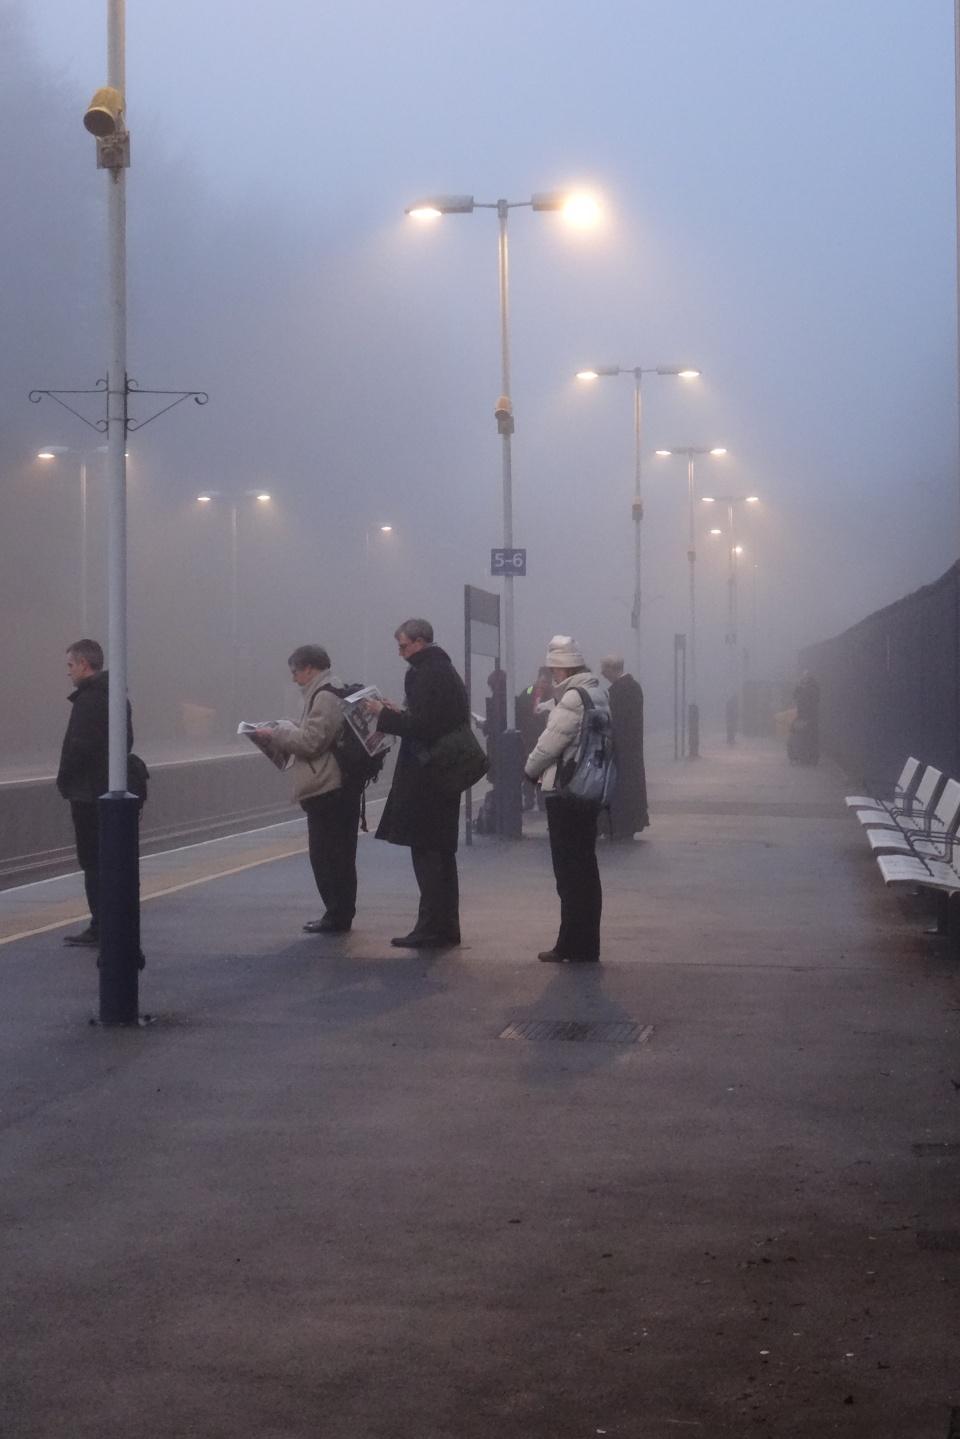 In freezing fog...